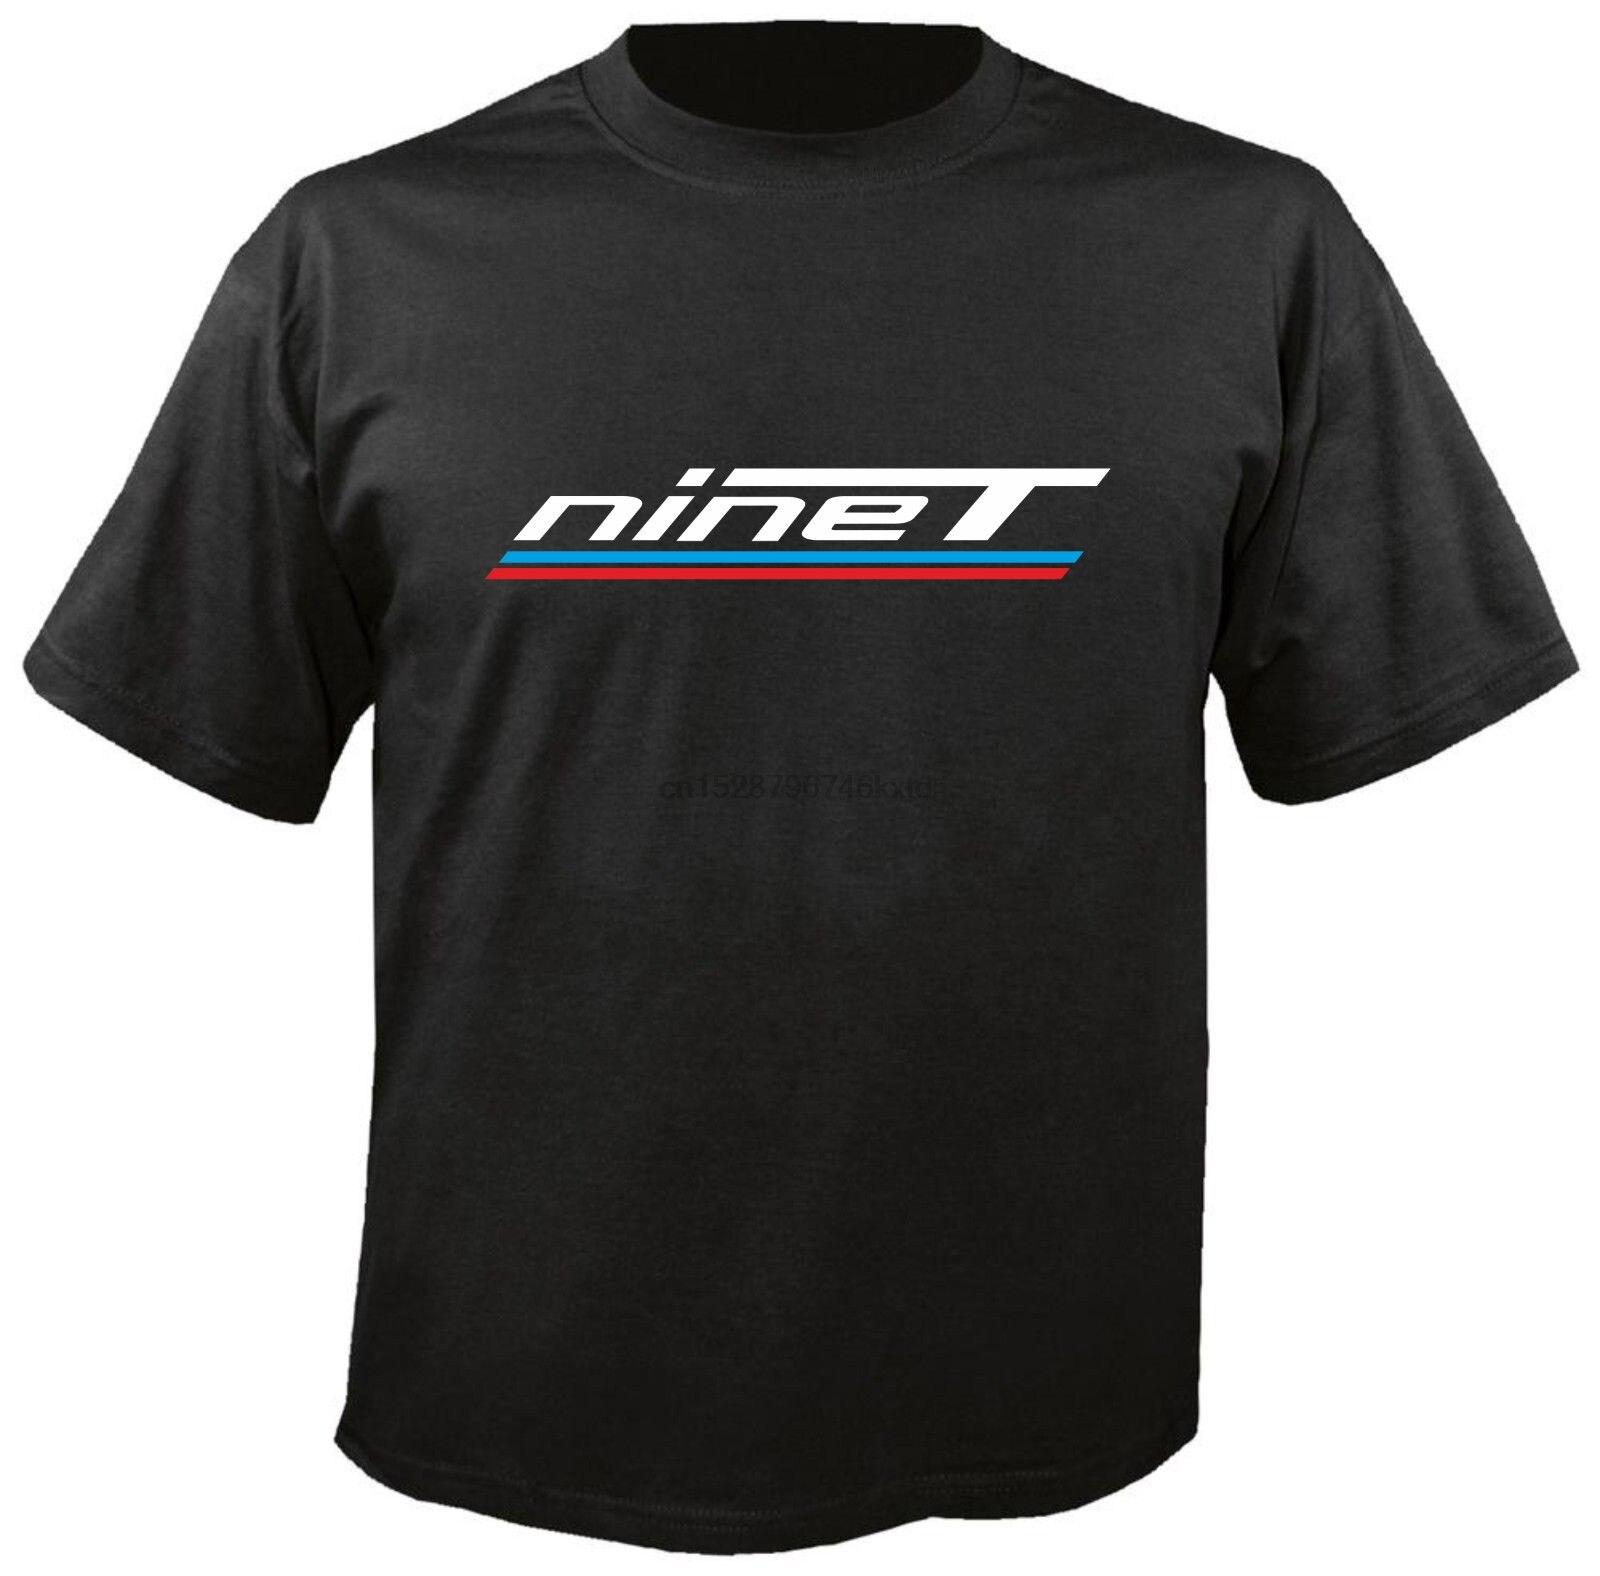 Camiseta de Fan para Driver Ninet R9T R 1200 Scrambler Roadster, camisetas novedosas para hombre, camisetas de manga corta impresas en 3D